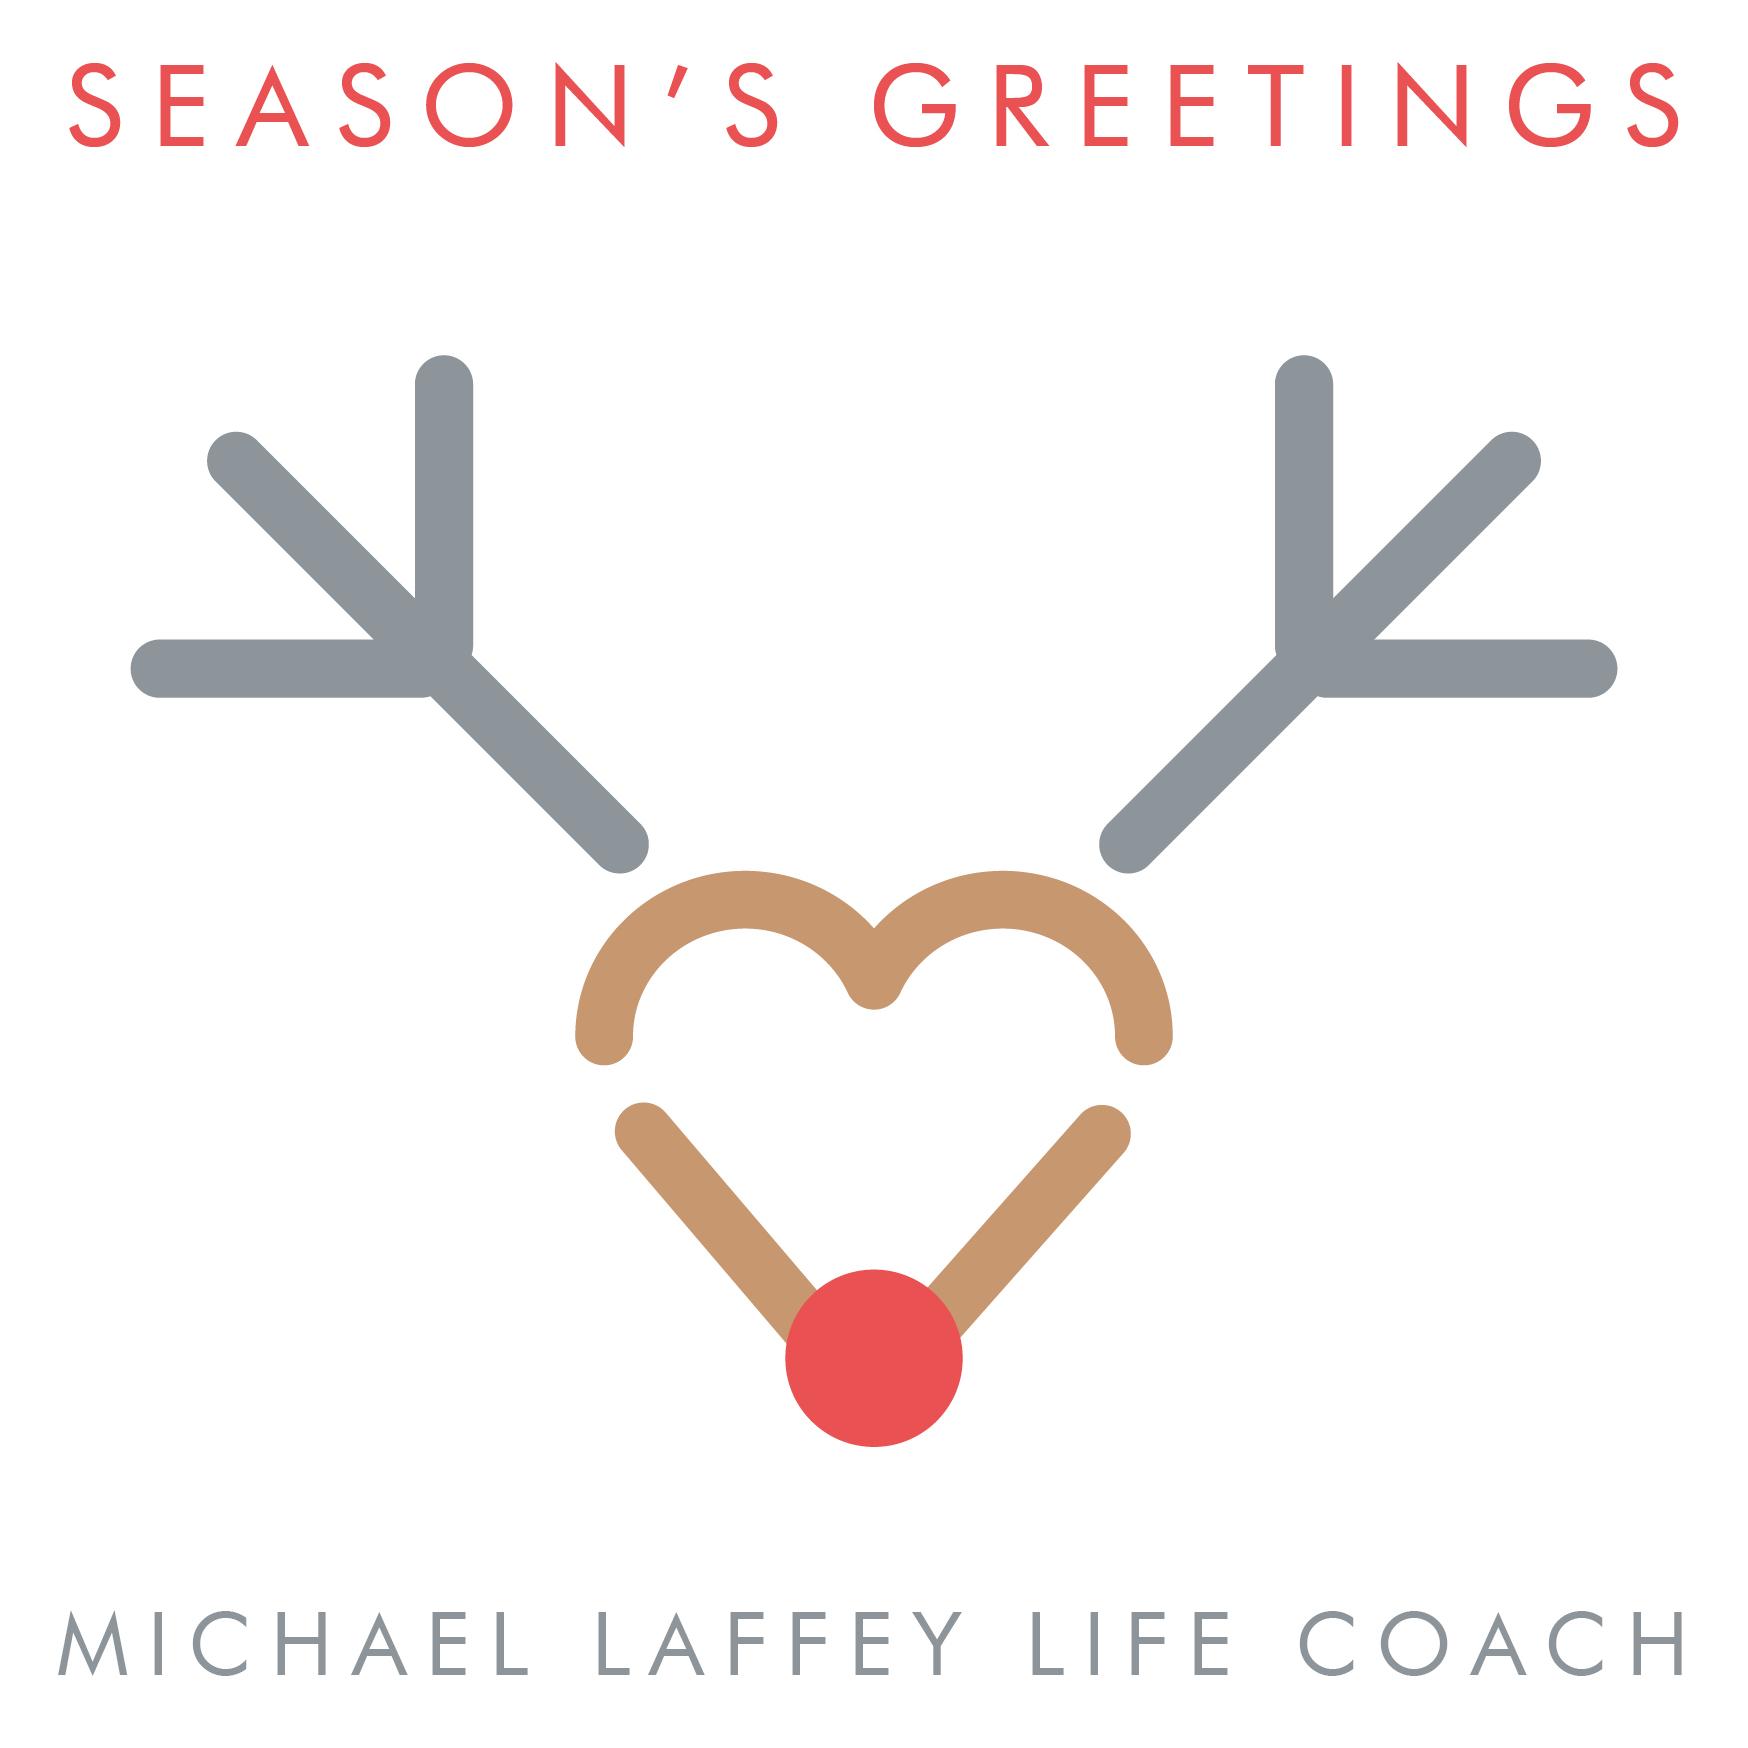 Season's Greetings, Seasons Greetings, Michael Laffey, Michael Laffey Life Coach, Life Coach, Sussex, Brighton, Hove